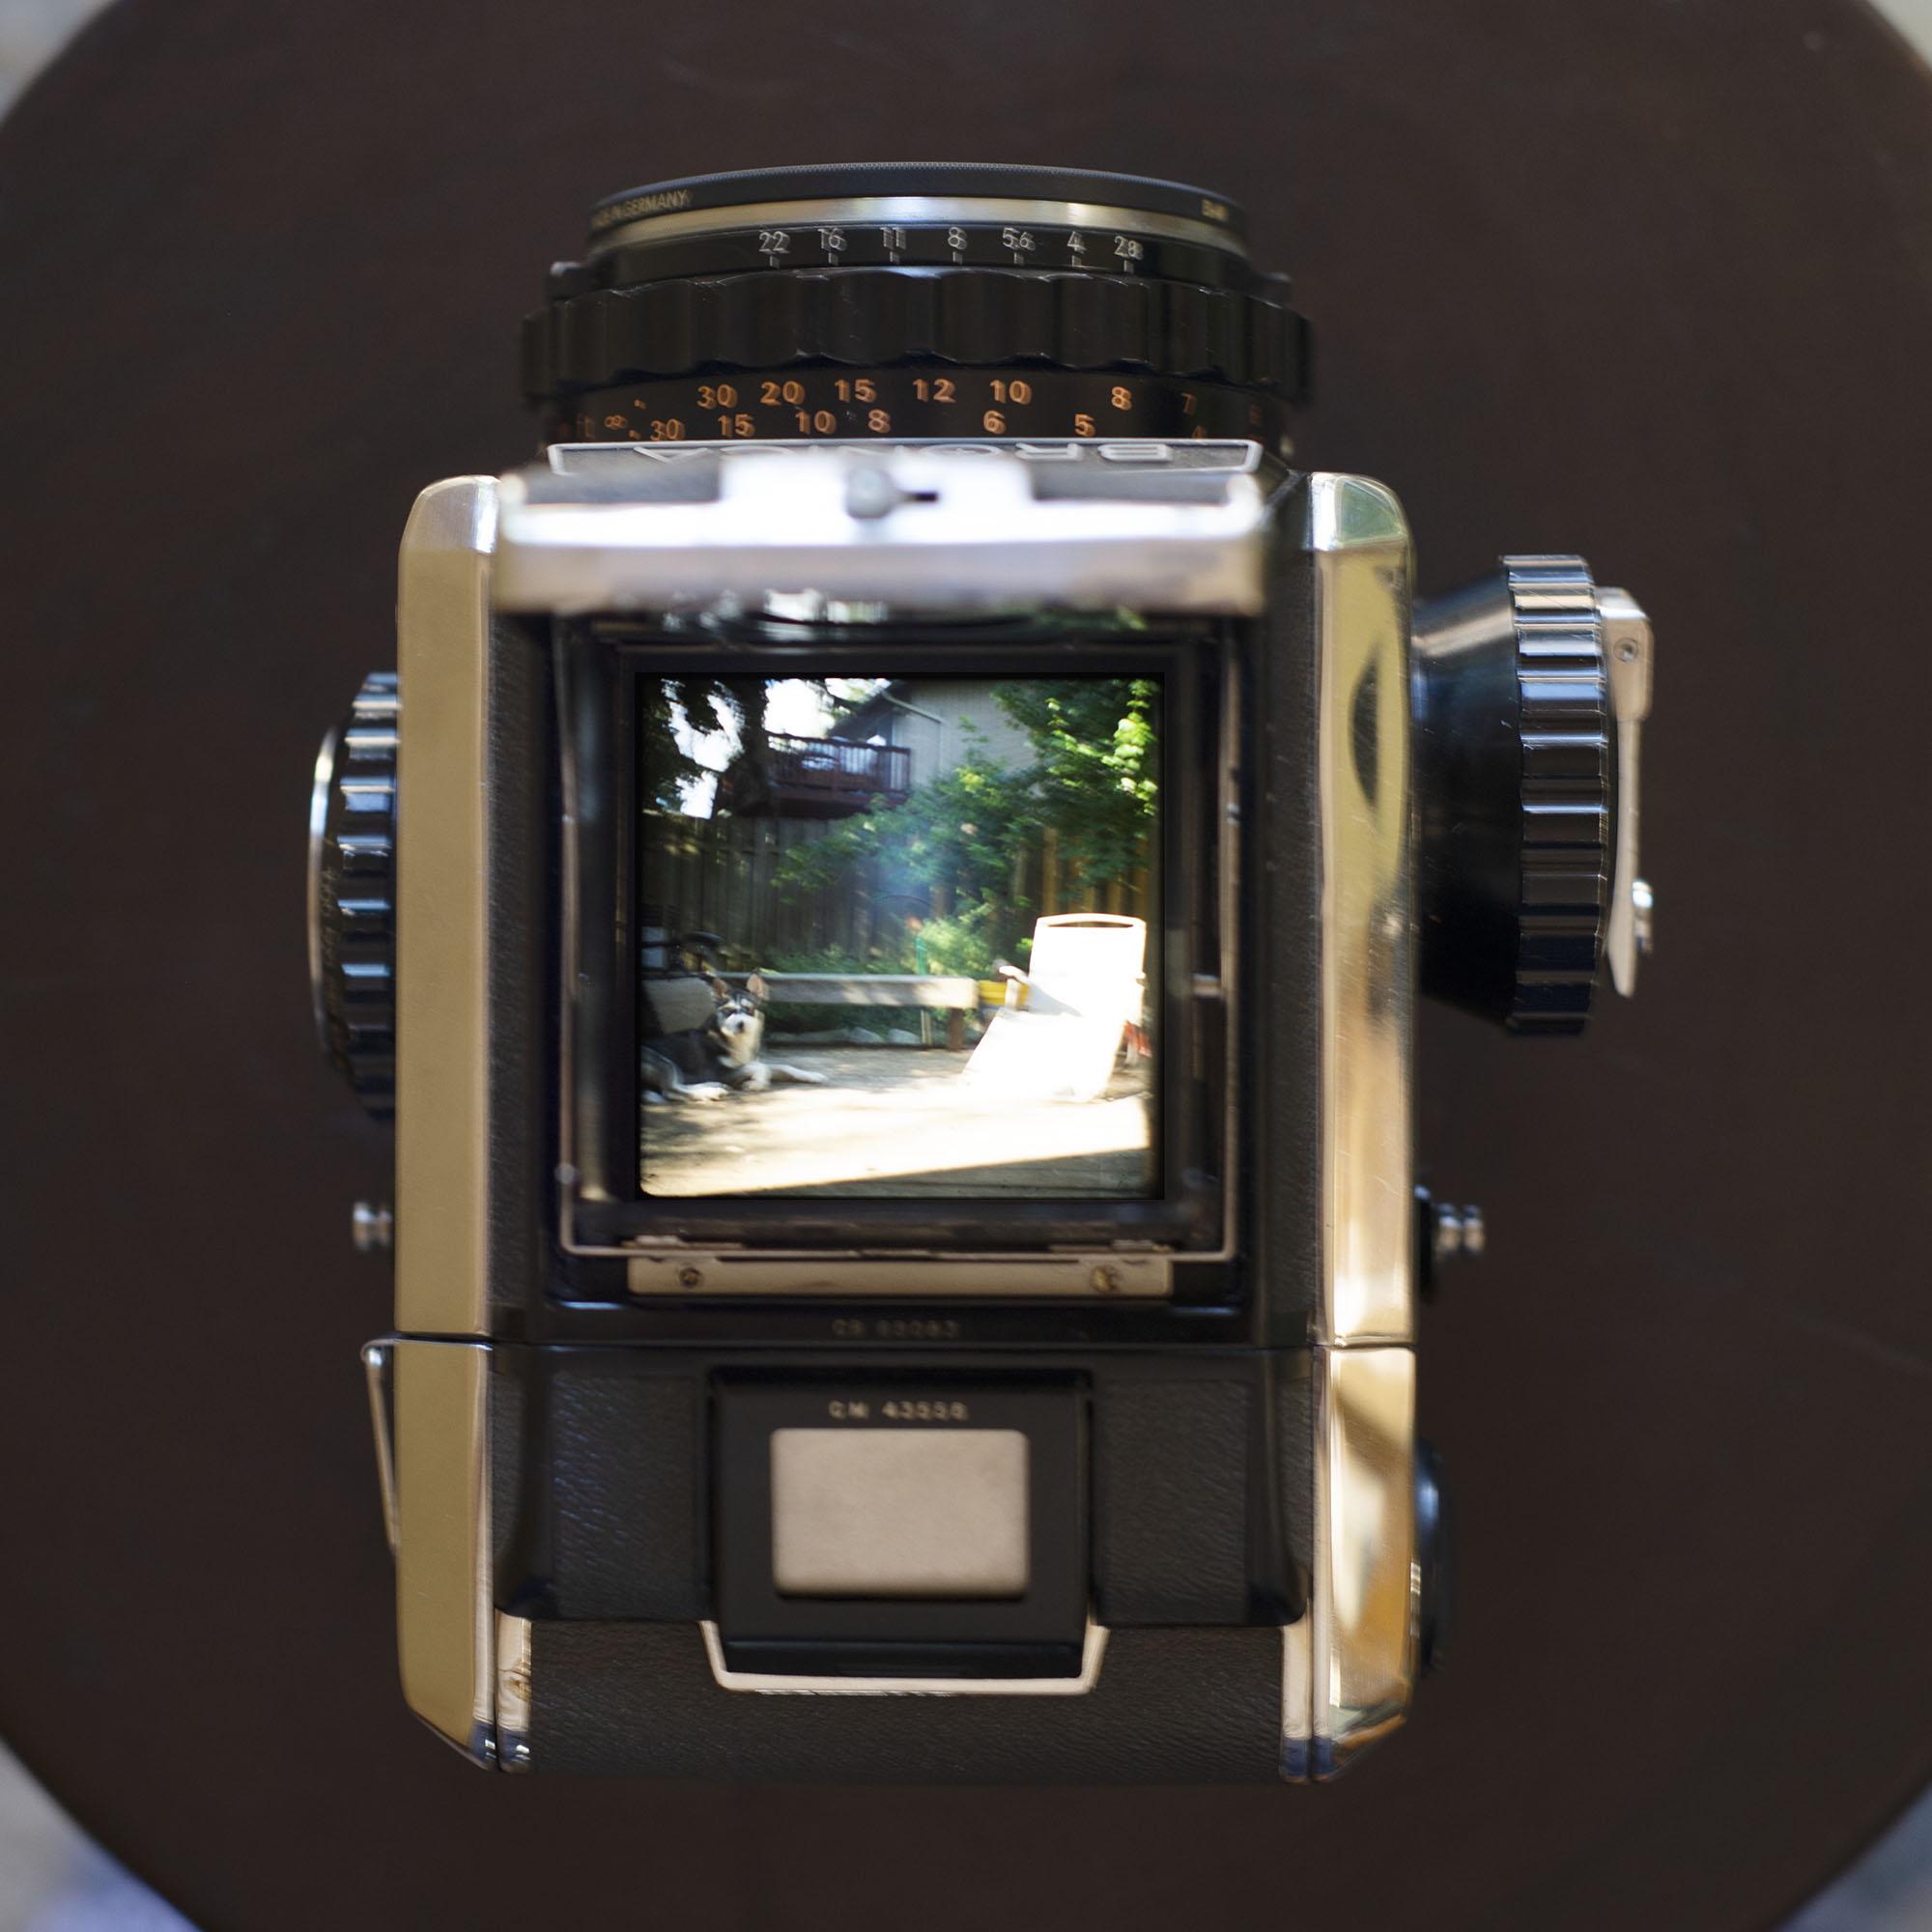 Bronica S2 view through the waist level finder